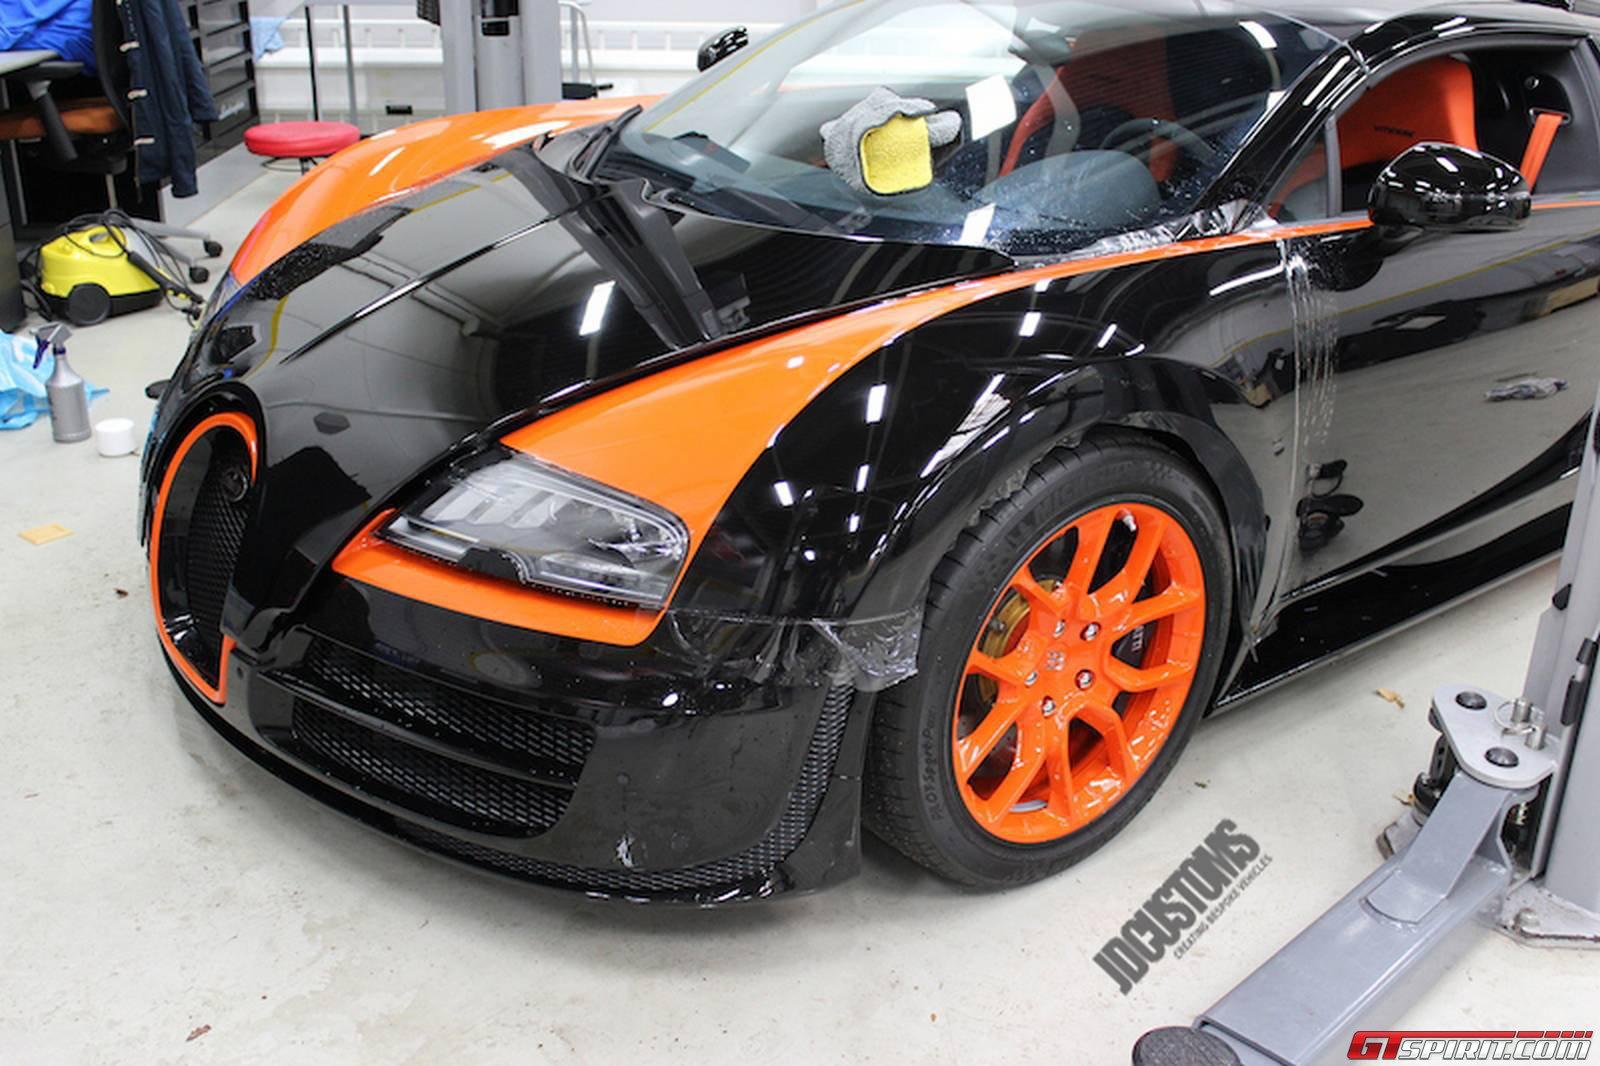 bugatti veyron grand sport vitesse wrc edition at jd customs. Black Bedroom Furniture Sets. Home Design Ideas